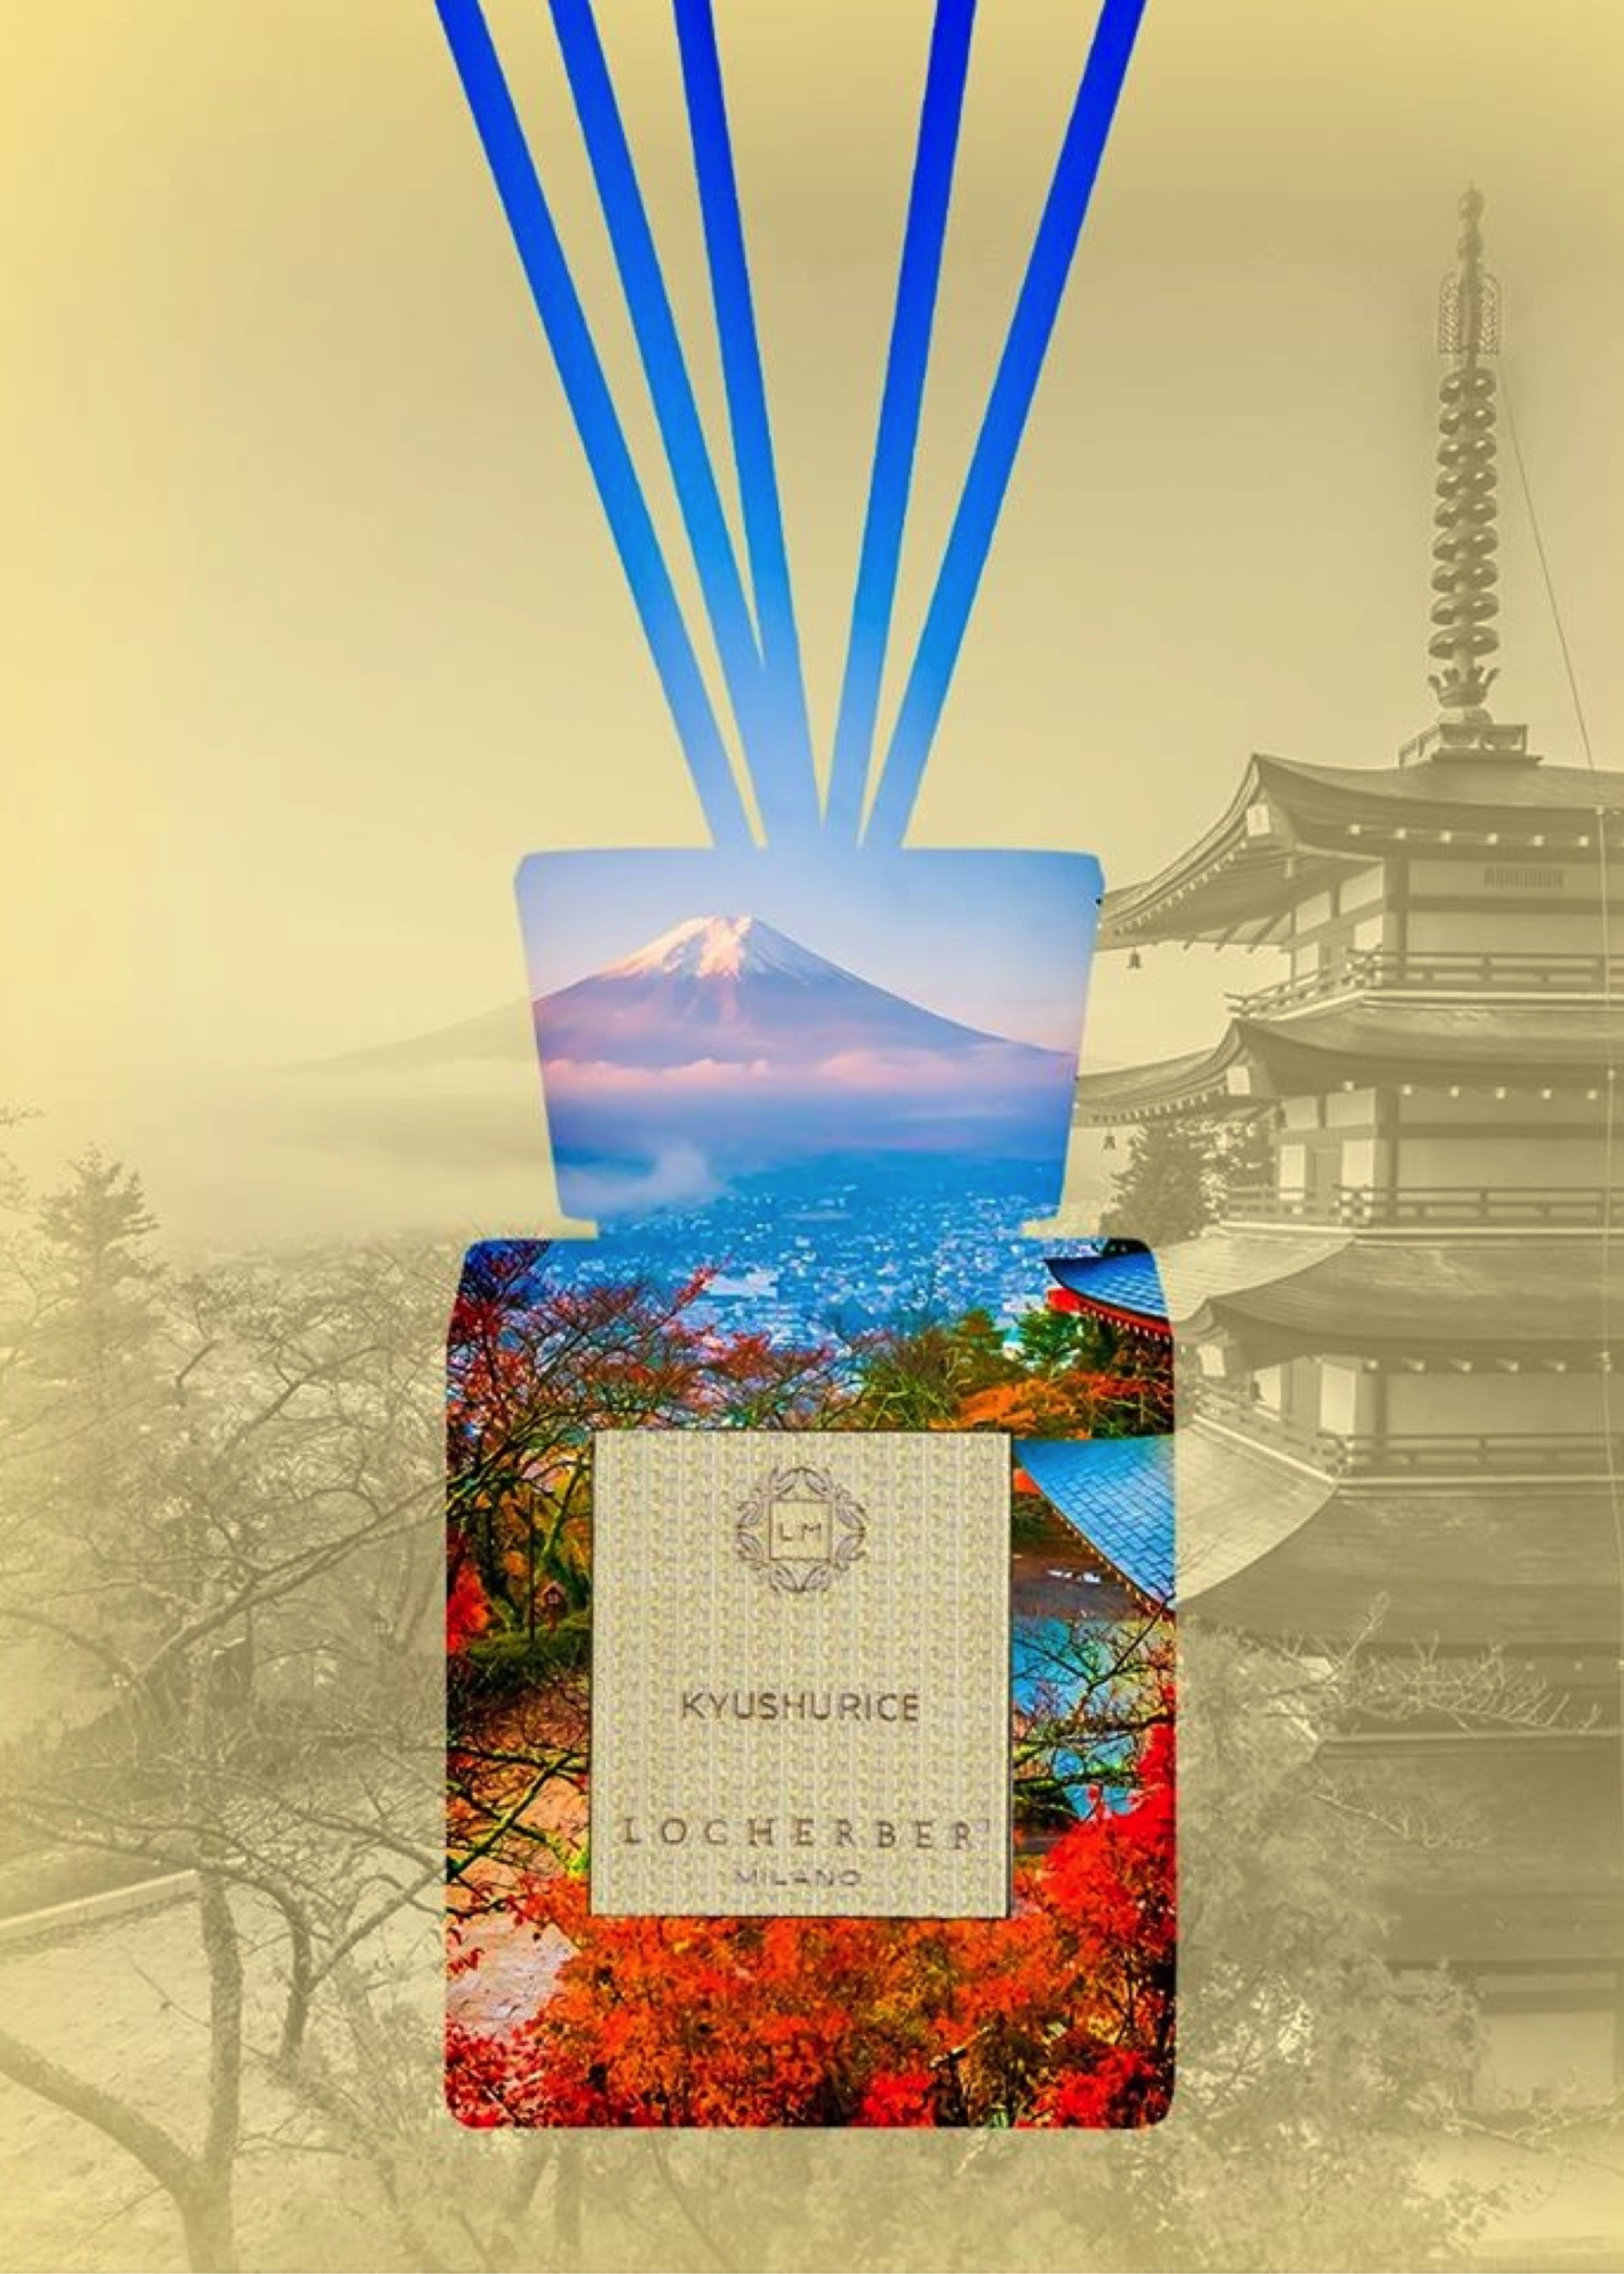 Locherber Locherber Milano - Kyushu Rice - Diffuser Cadeau Set